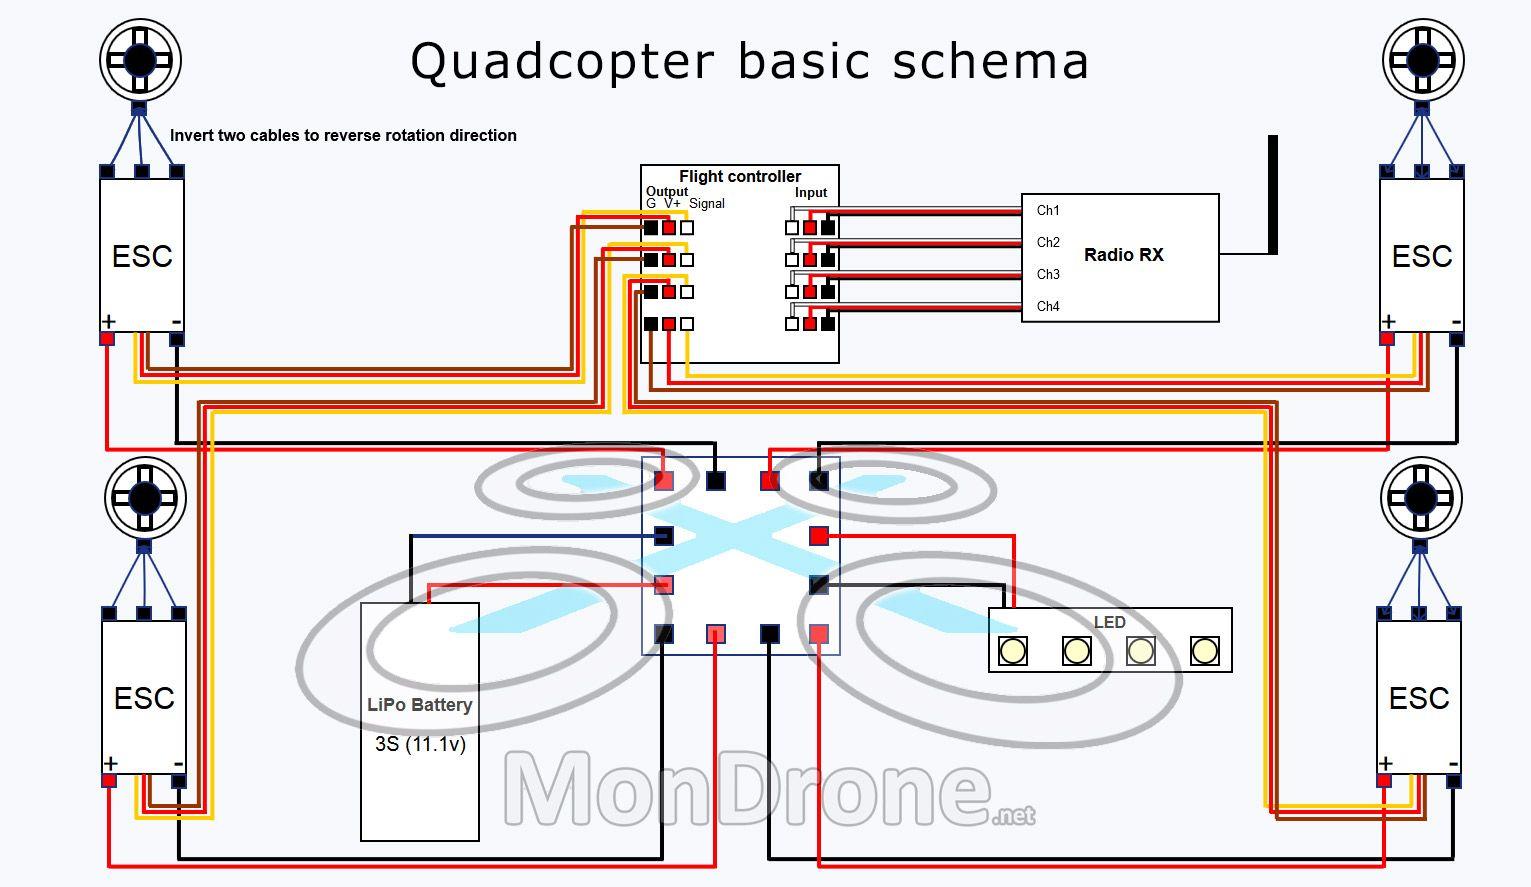 Quadcopter receiver wiring diagram 2000 jeep wrangler fuse box location quadcopter basic schemajpg 1531887 bello pinterest 830e260f5009de5dc6c5ce2ada9cbc46 839147343038283945 quadcopter receiver wiring diagram swarovskicordoba Image collections